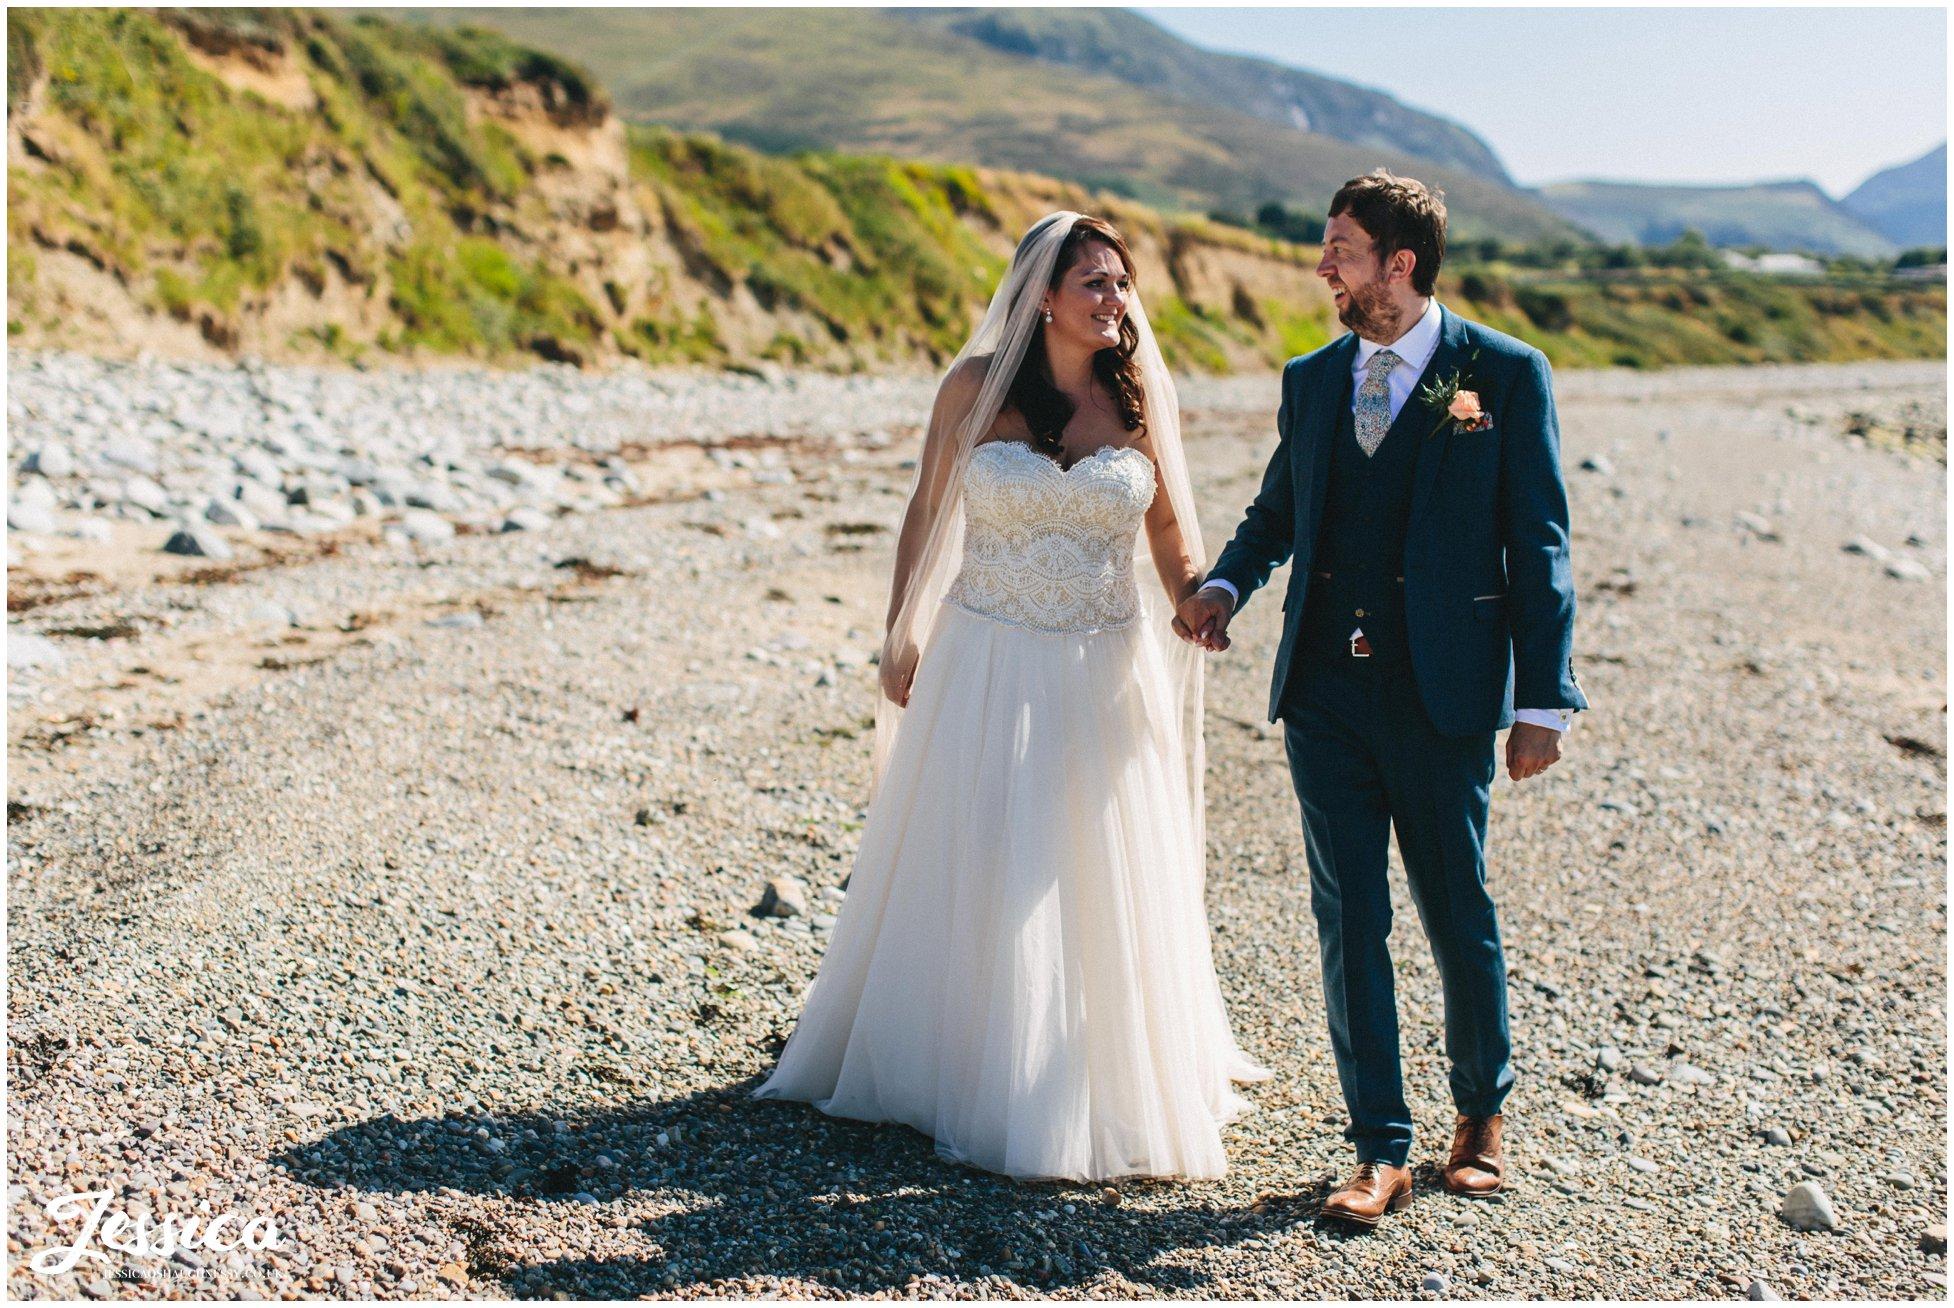 newly wed's walk hand in hand down Caernarfon bay beach